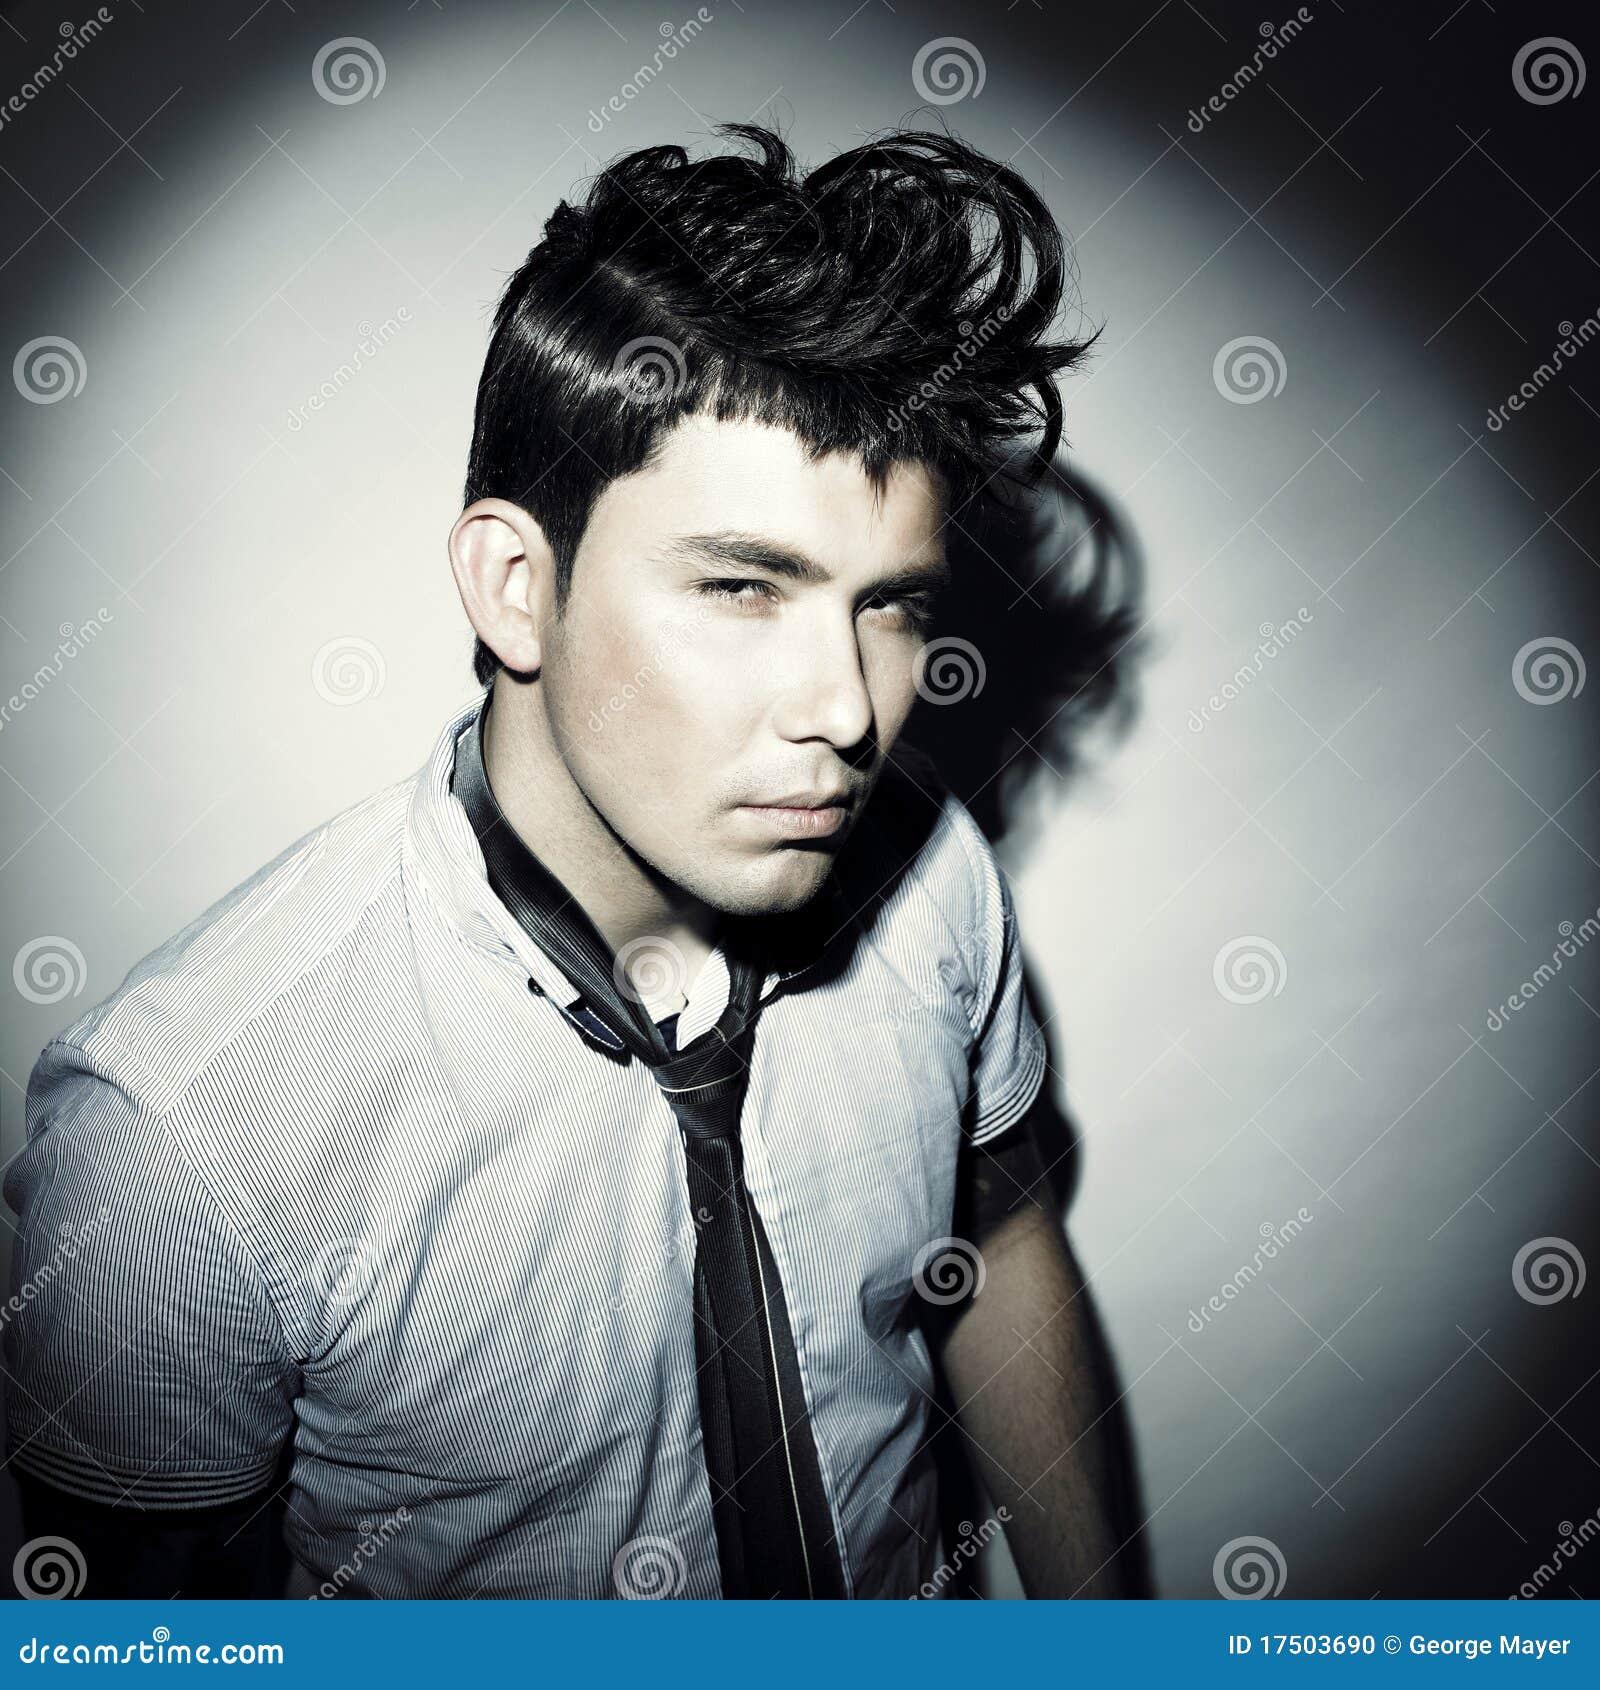 Stylish Handsome Men Stock Photo Image Of People Light 17503690